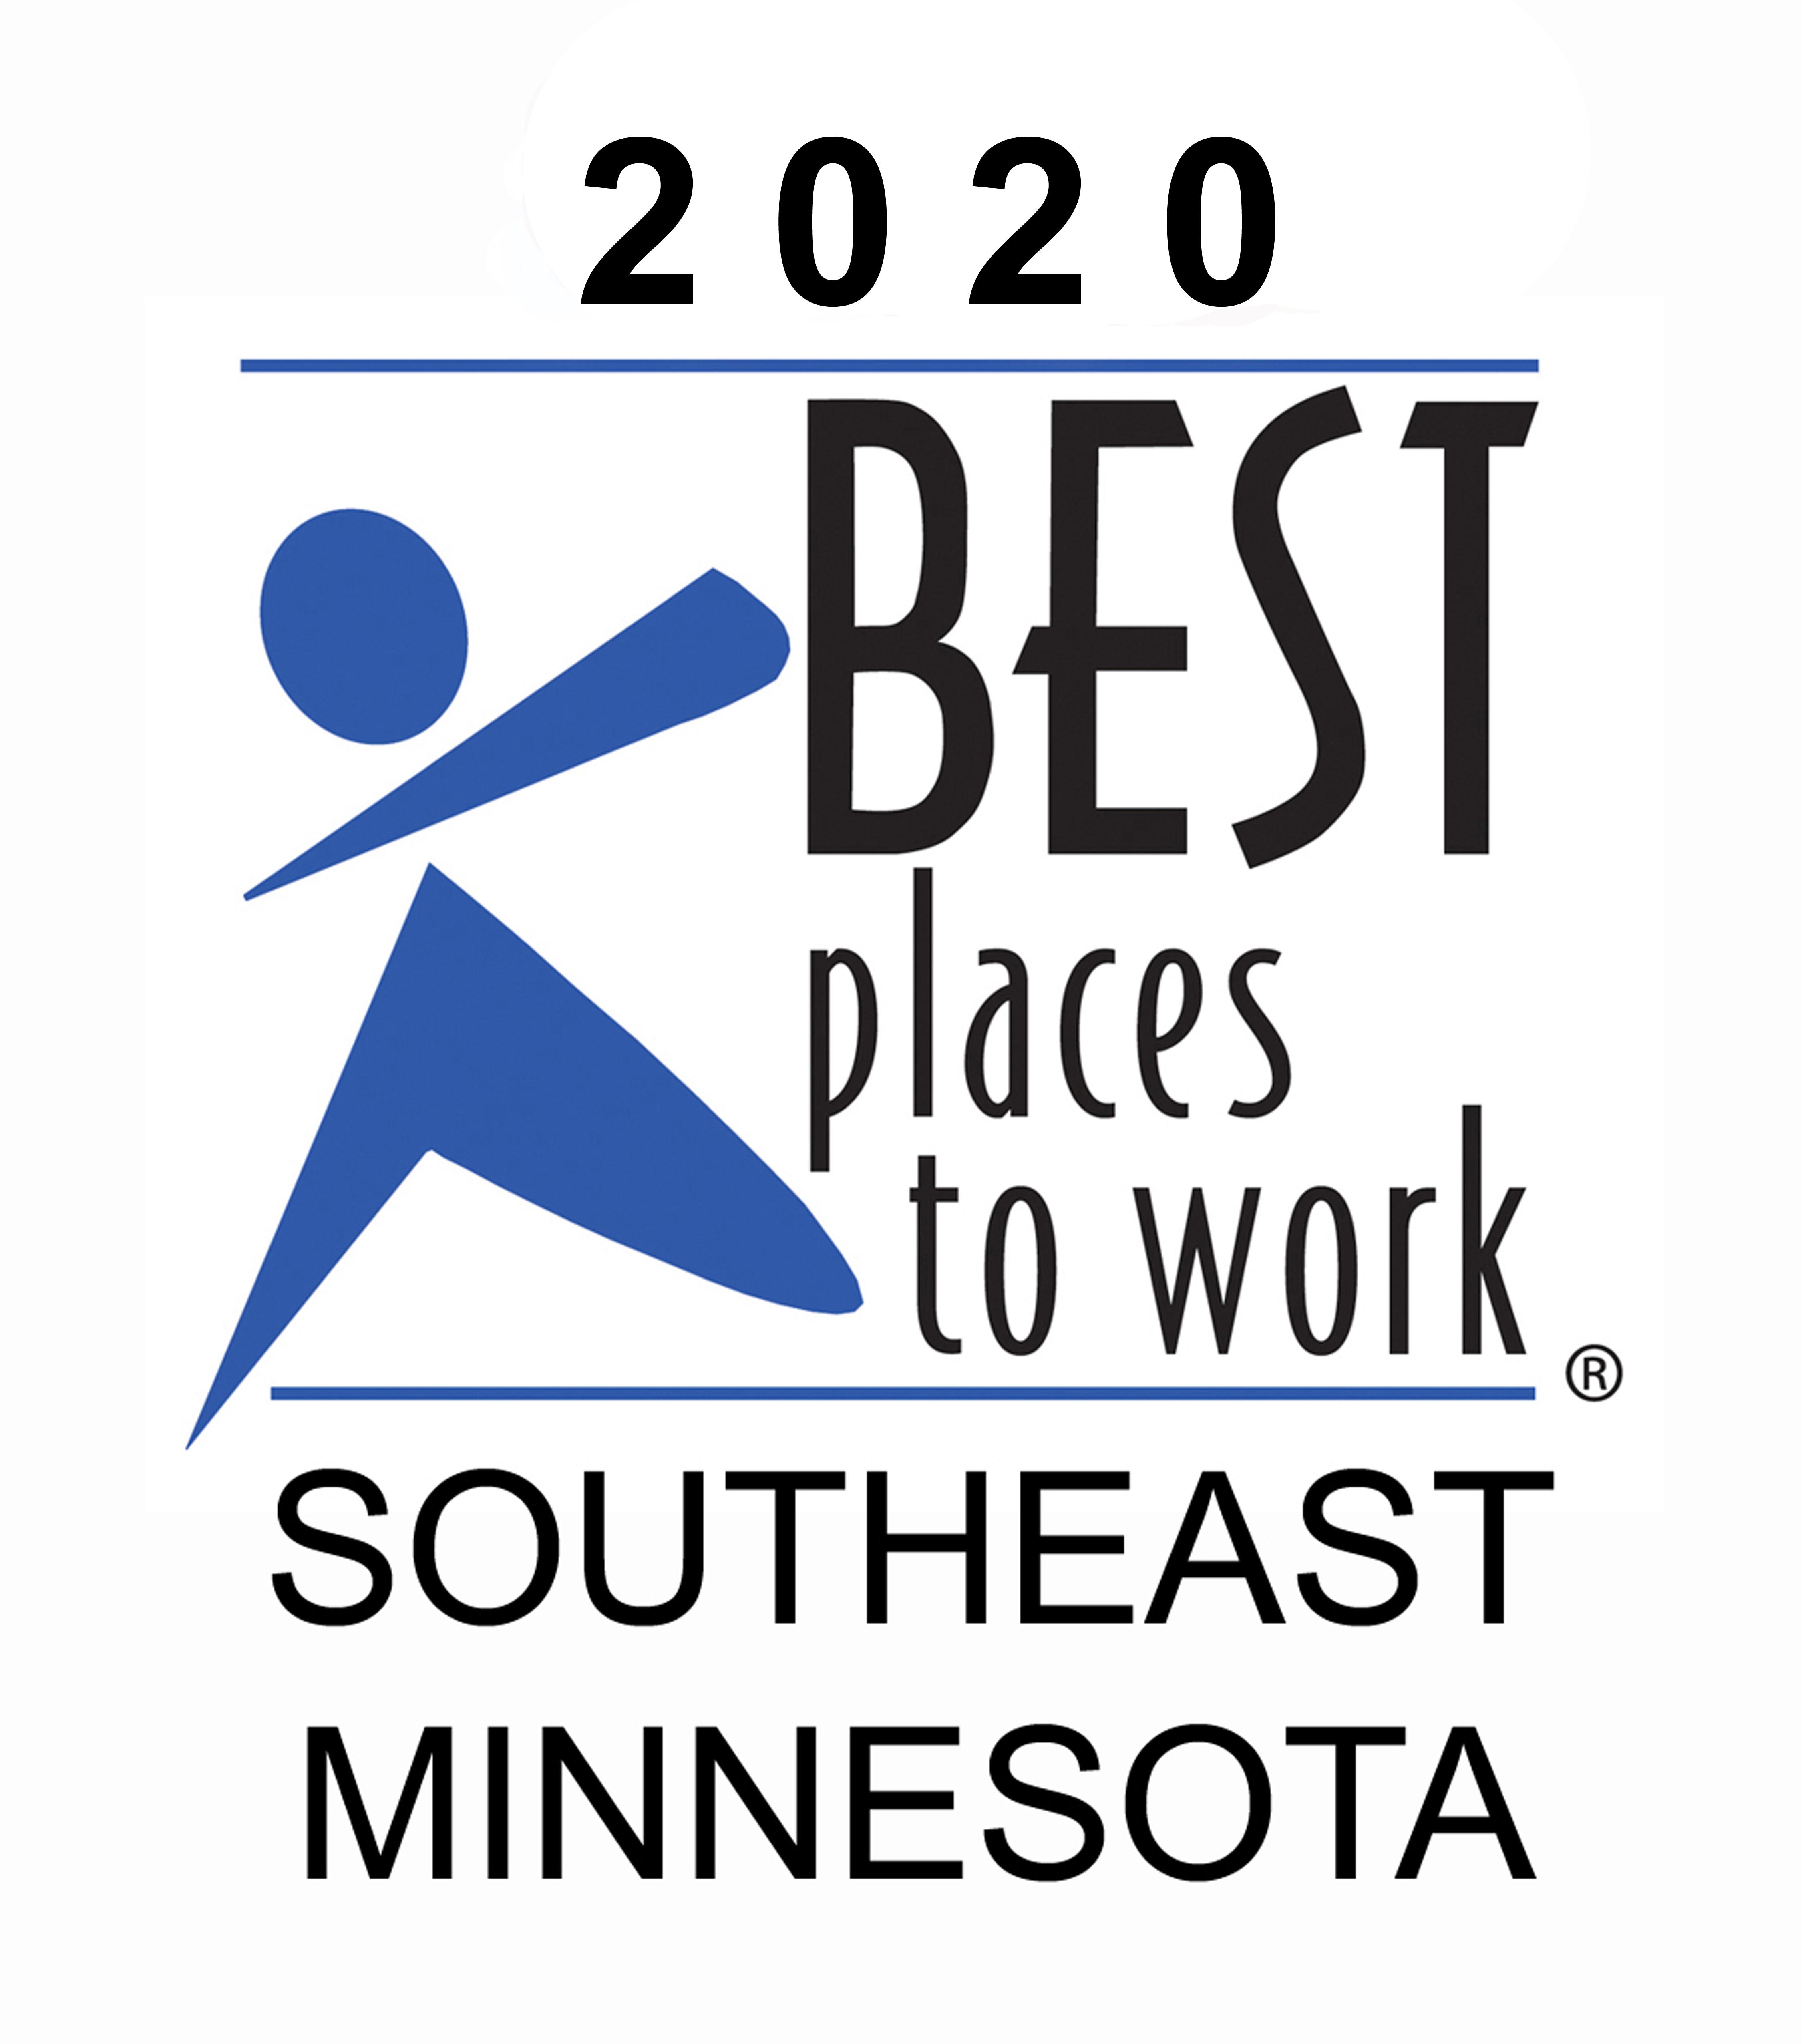 BestPlacesToWork_LOGO - SE Minnesota 2020